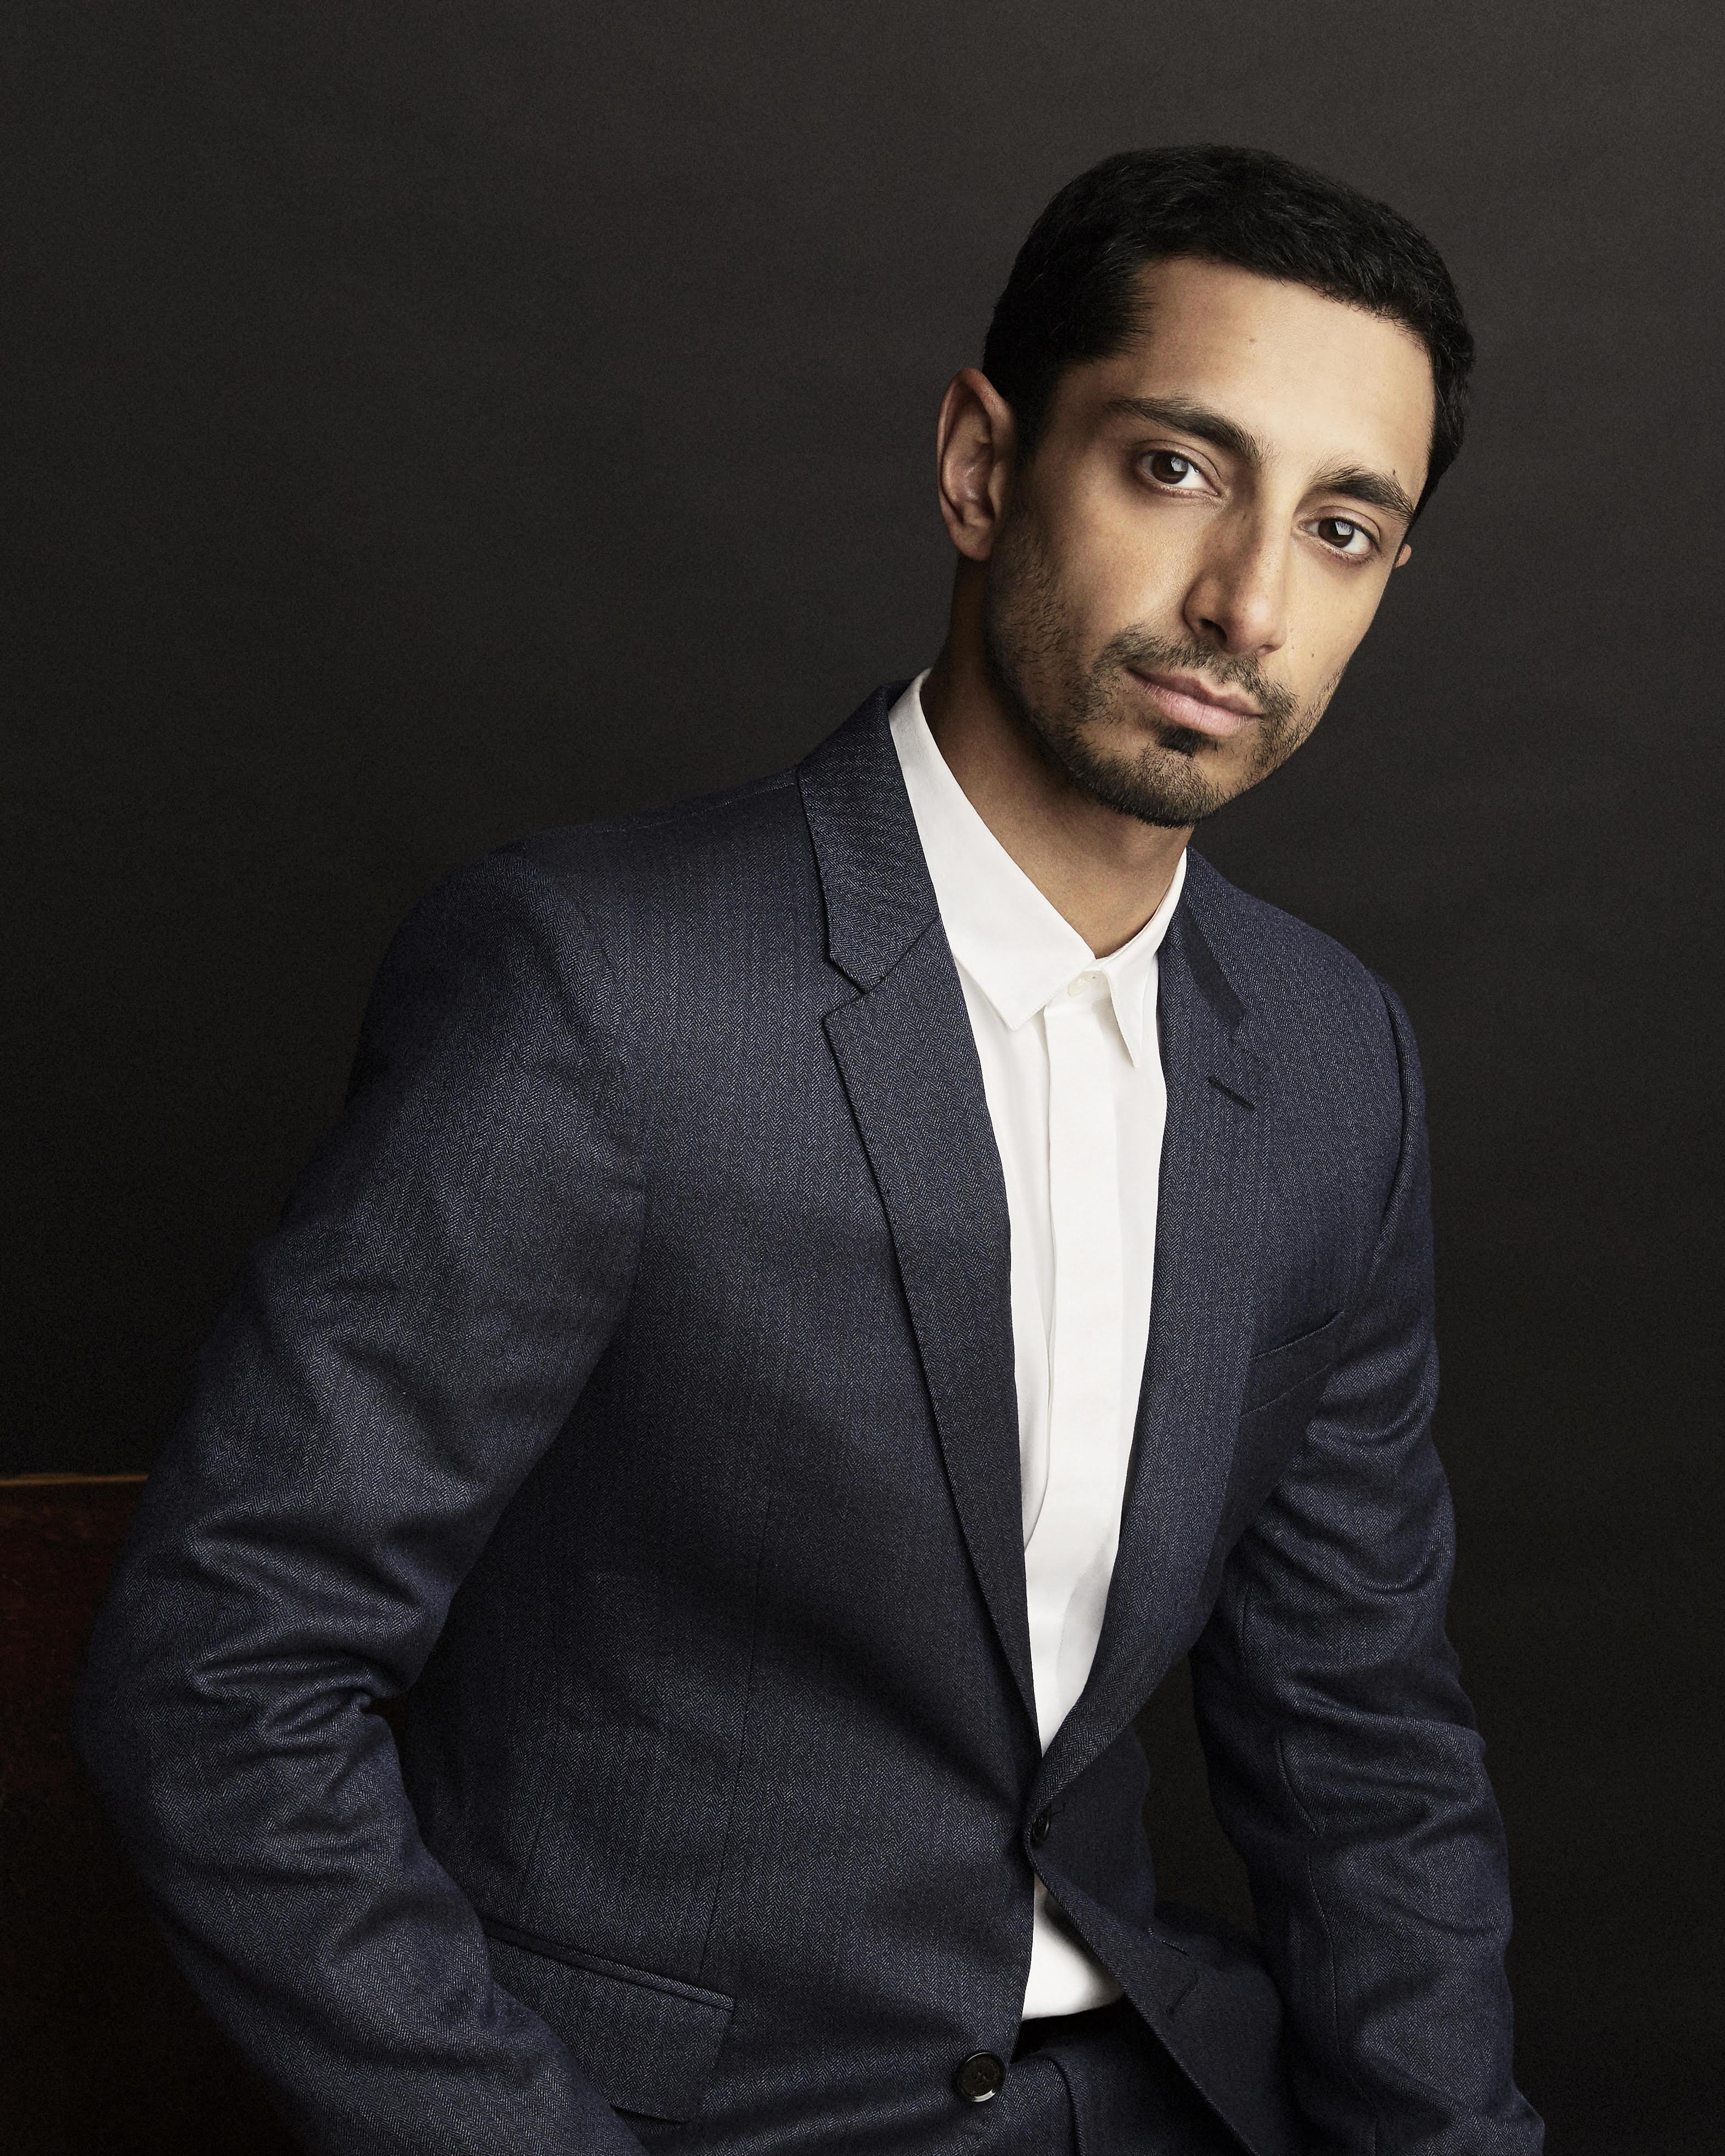 Riz Ahmed, British Pakistani actor, rapper and activist